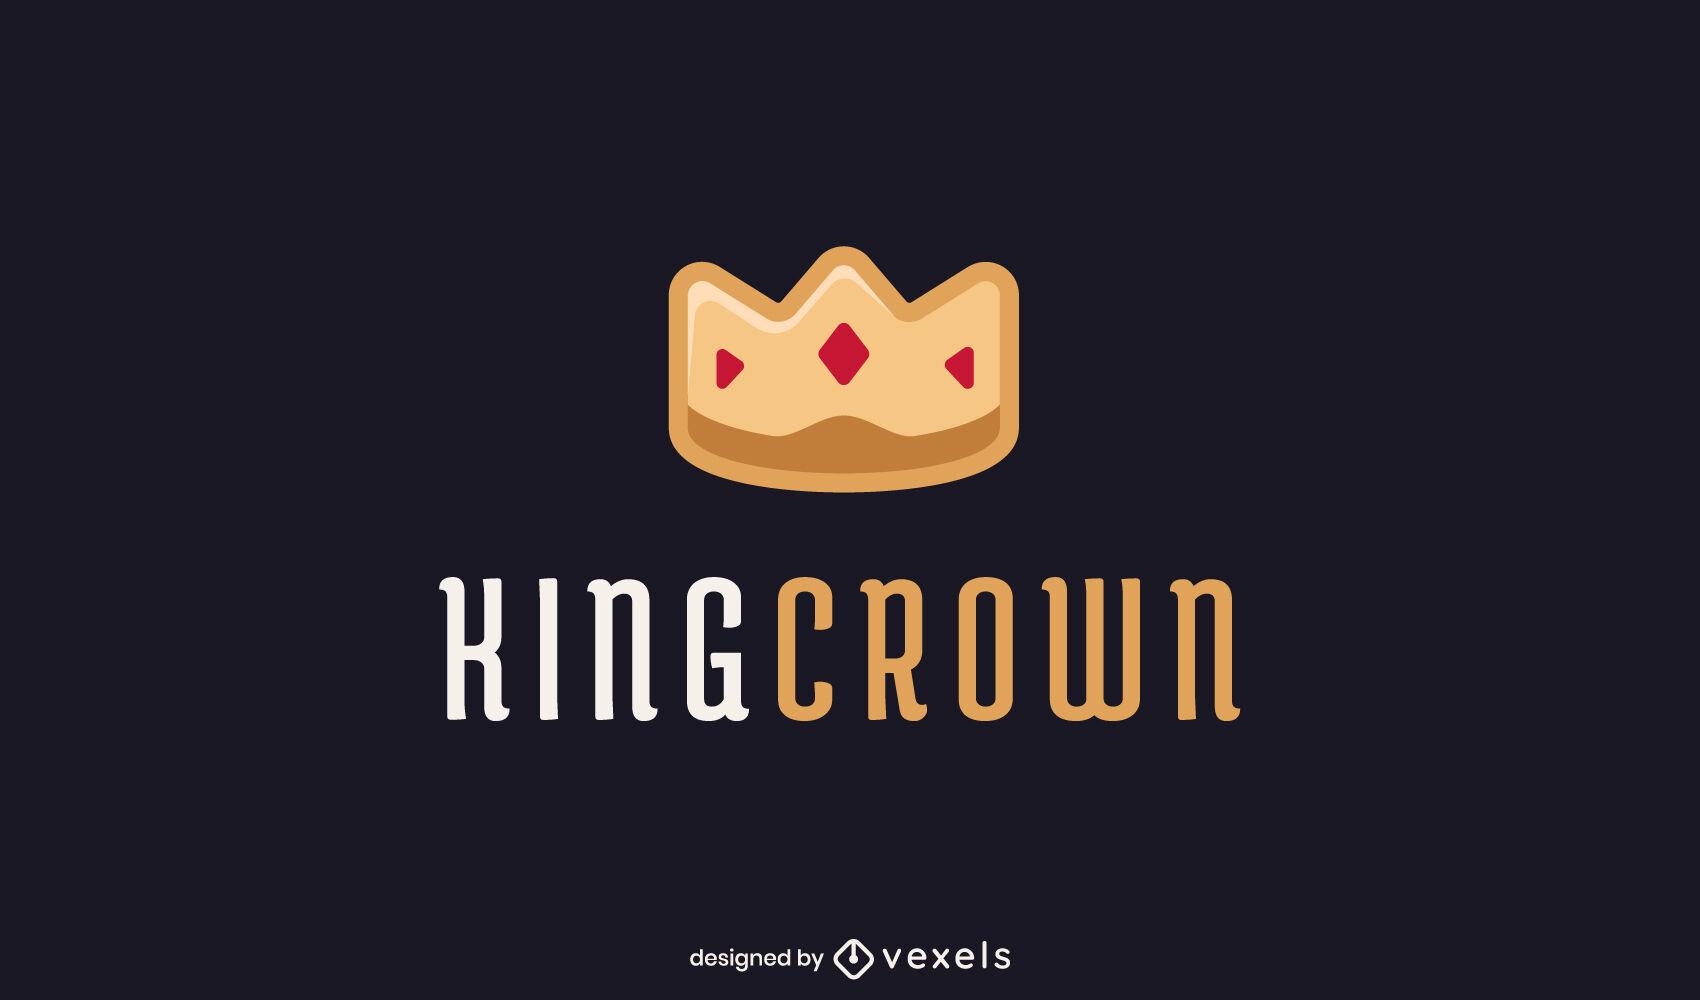 Golden crown king royalty logo template